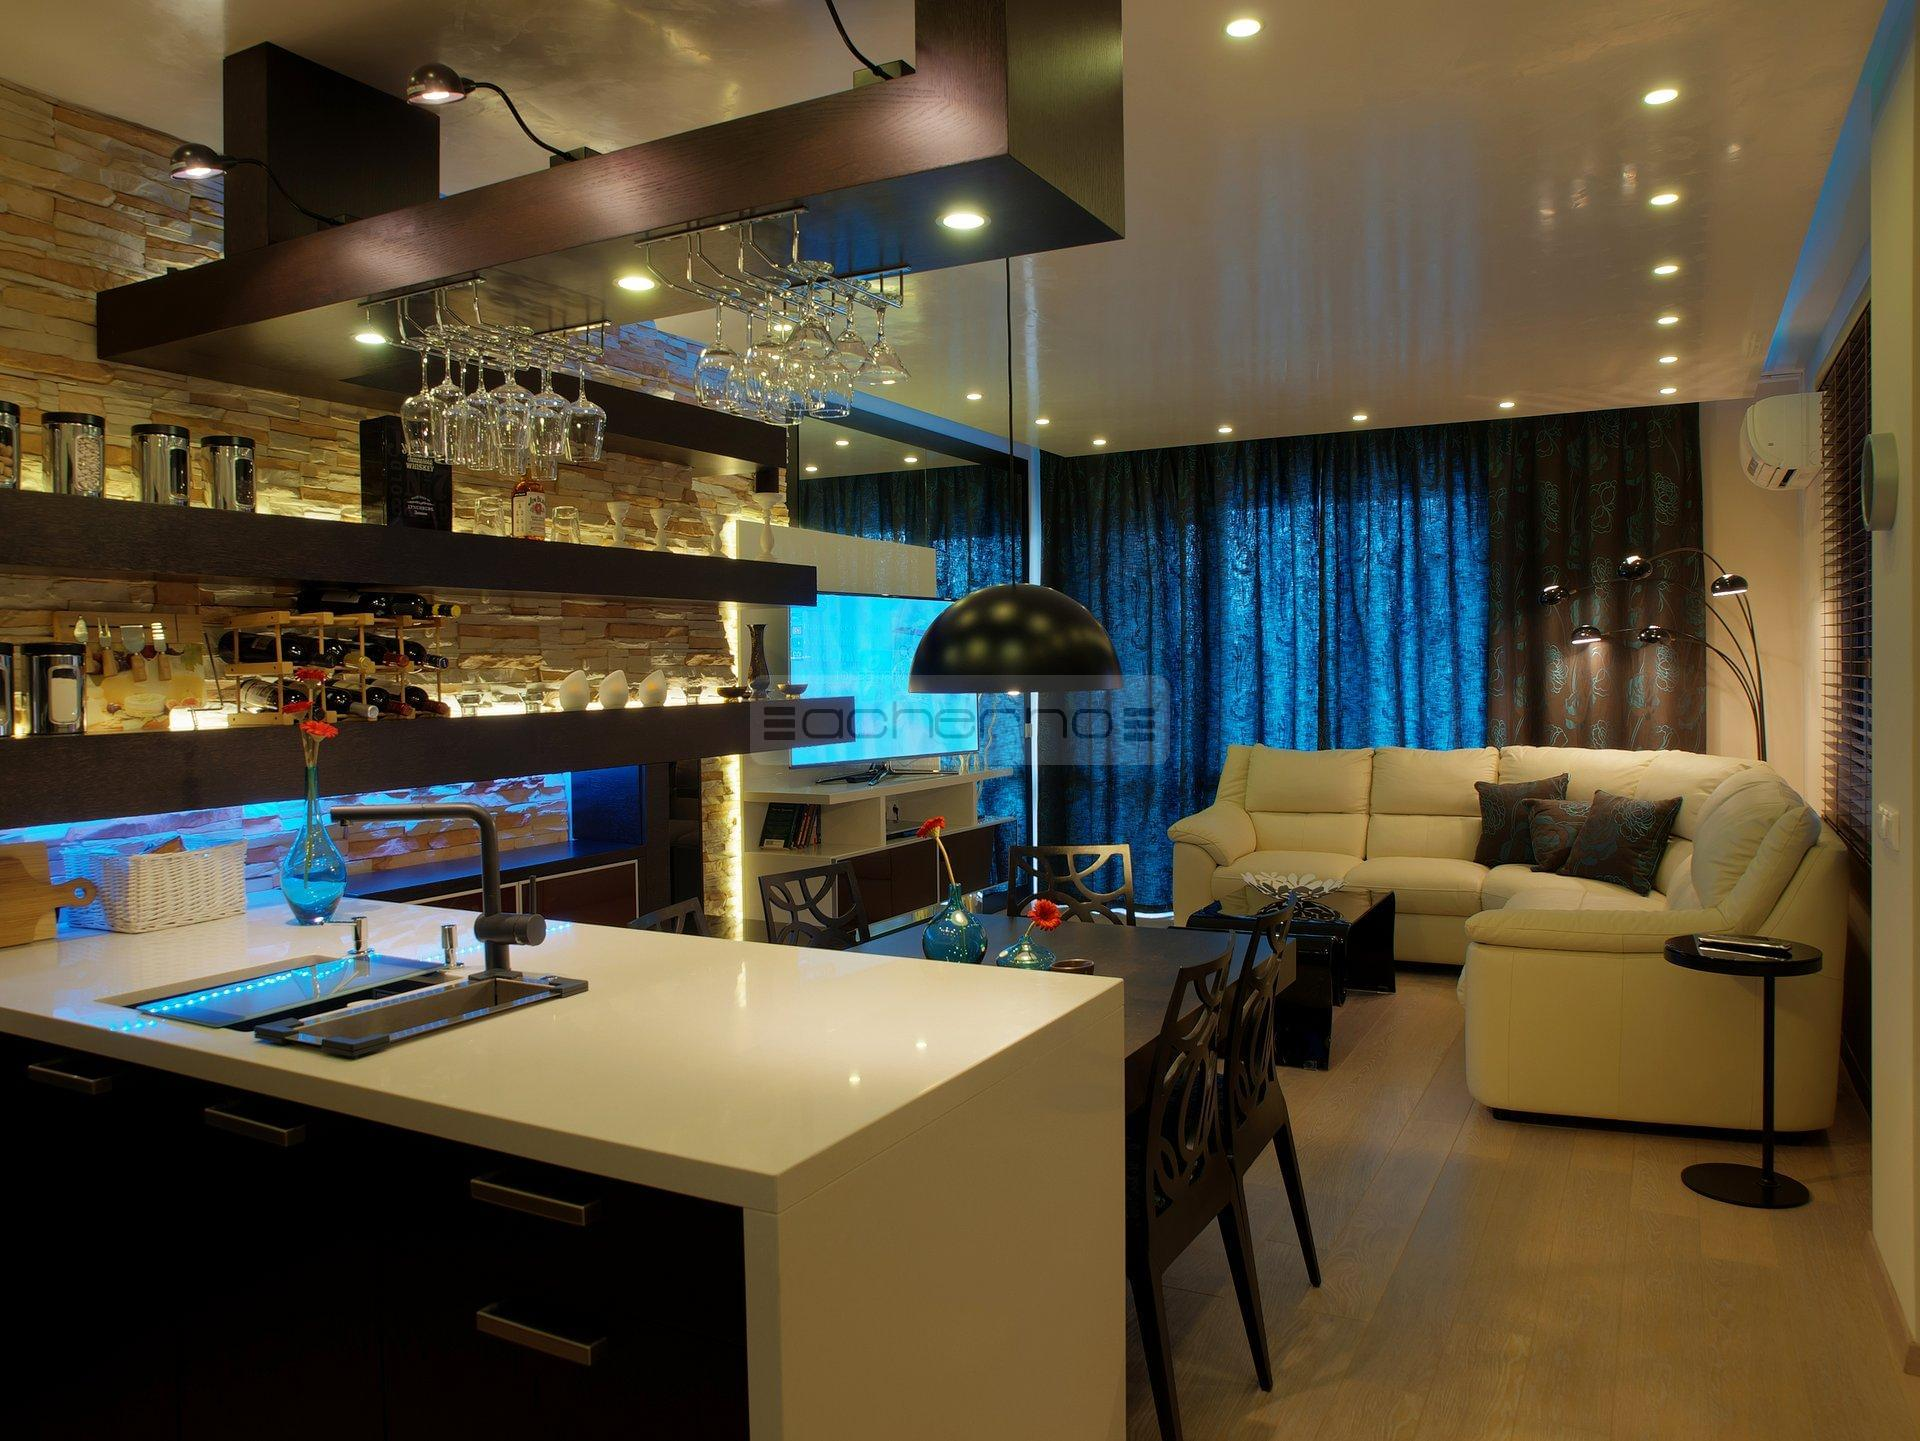 Acherno raumgestaltung new york for Raumgestaltung cafe